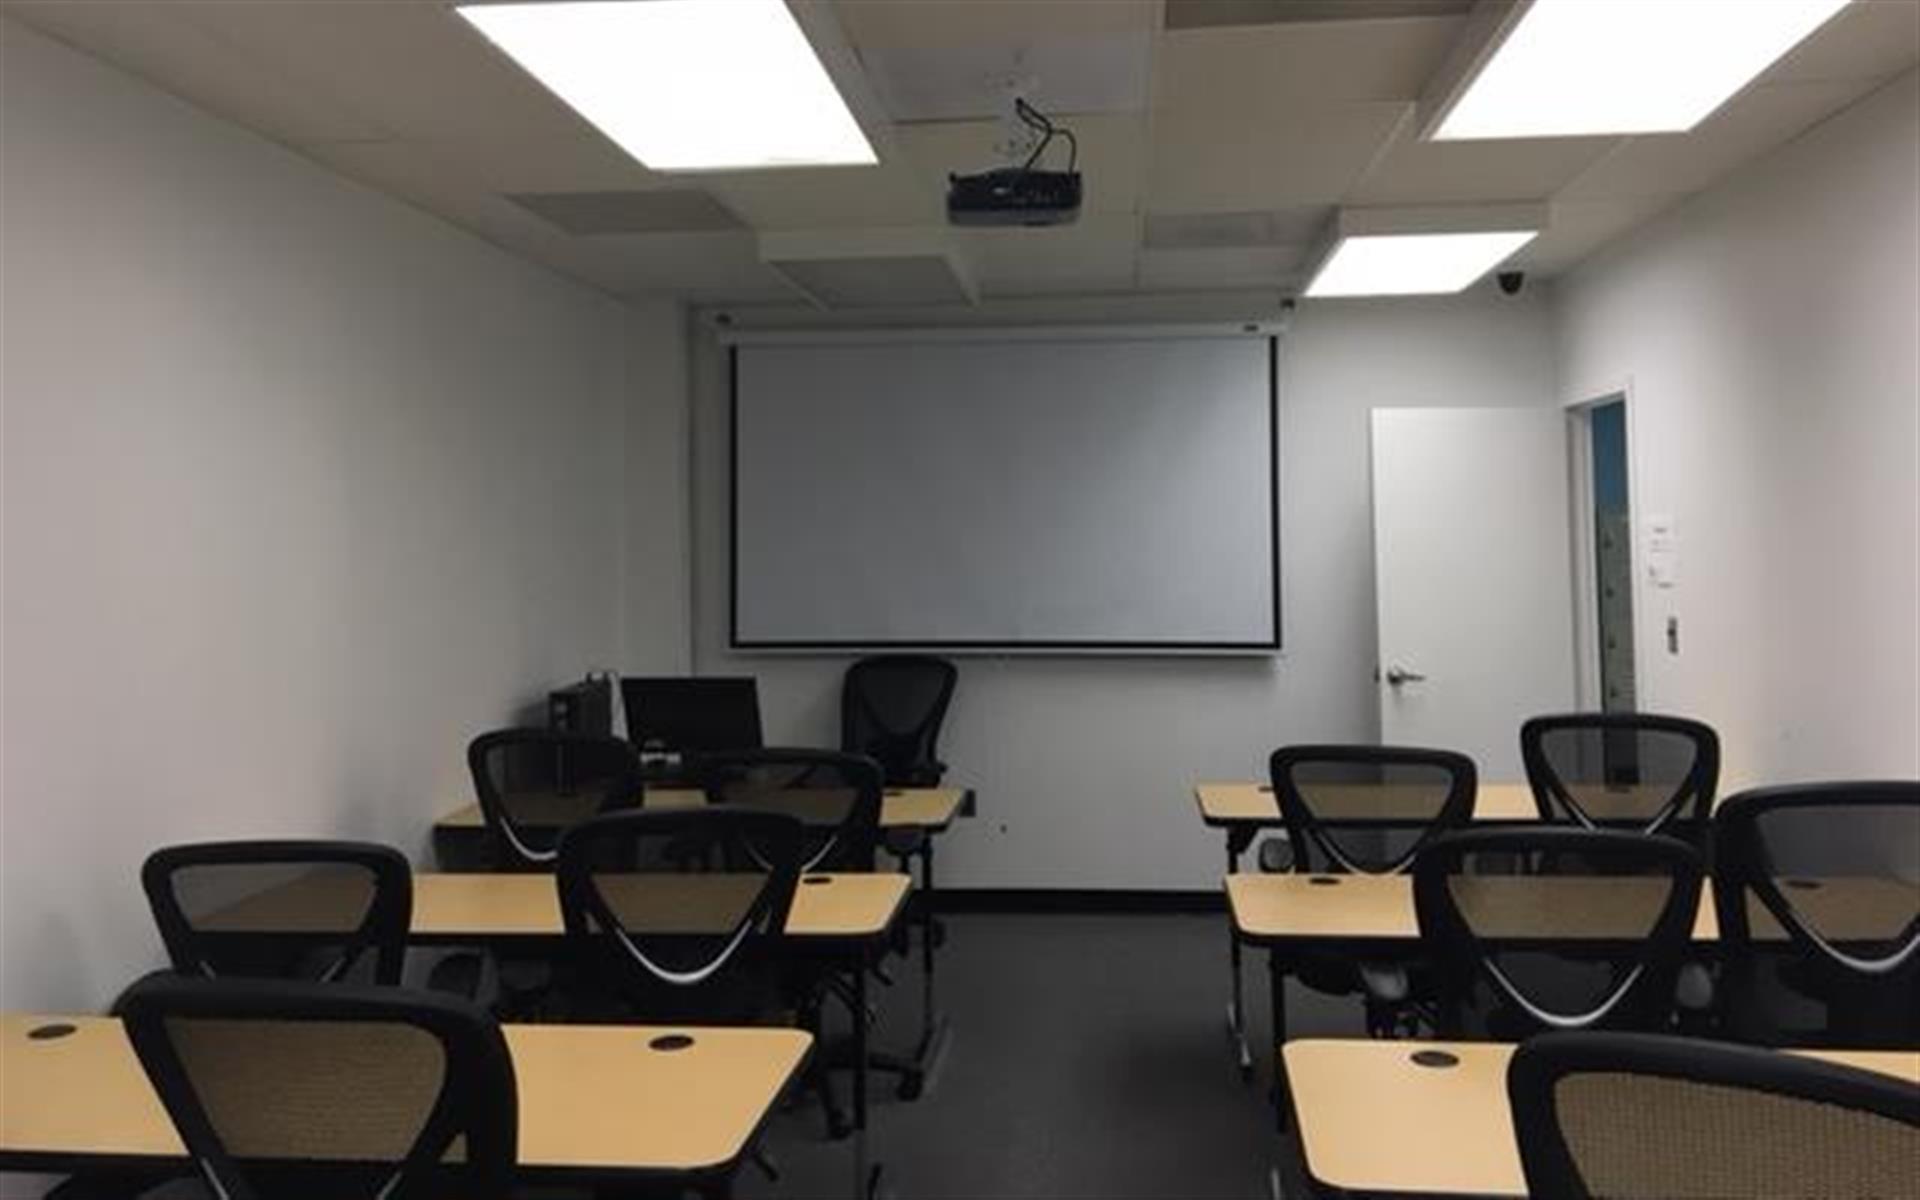 Technical Institute of America - 1020